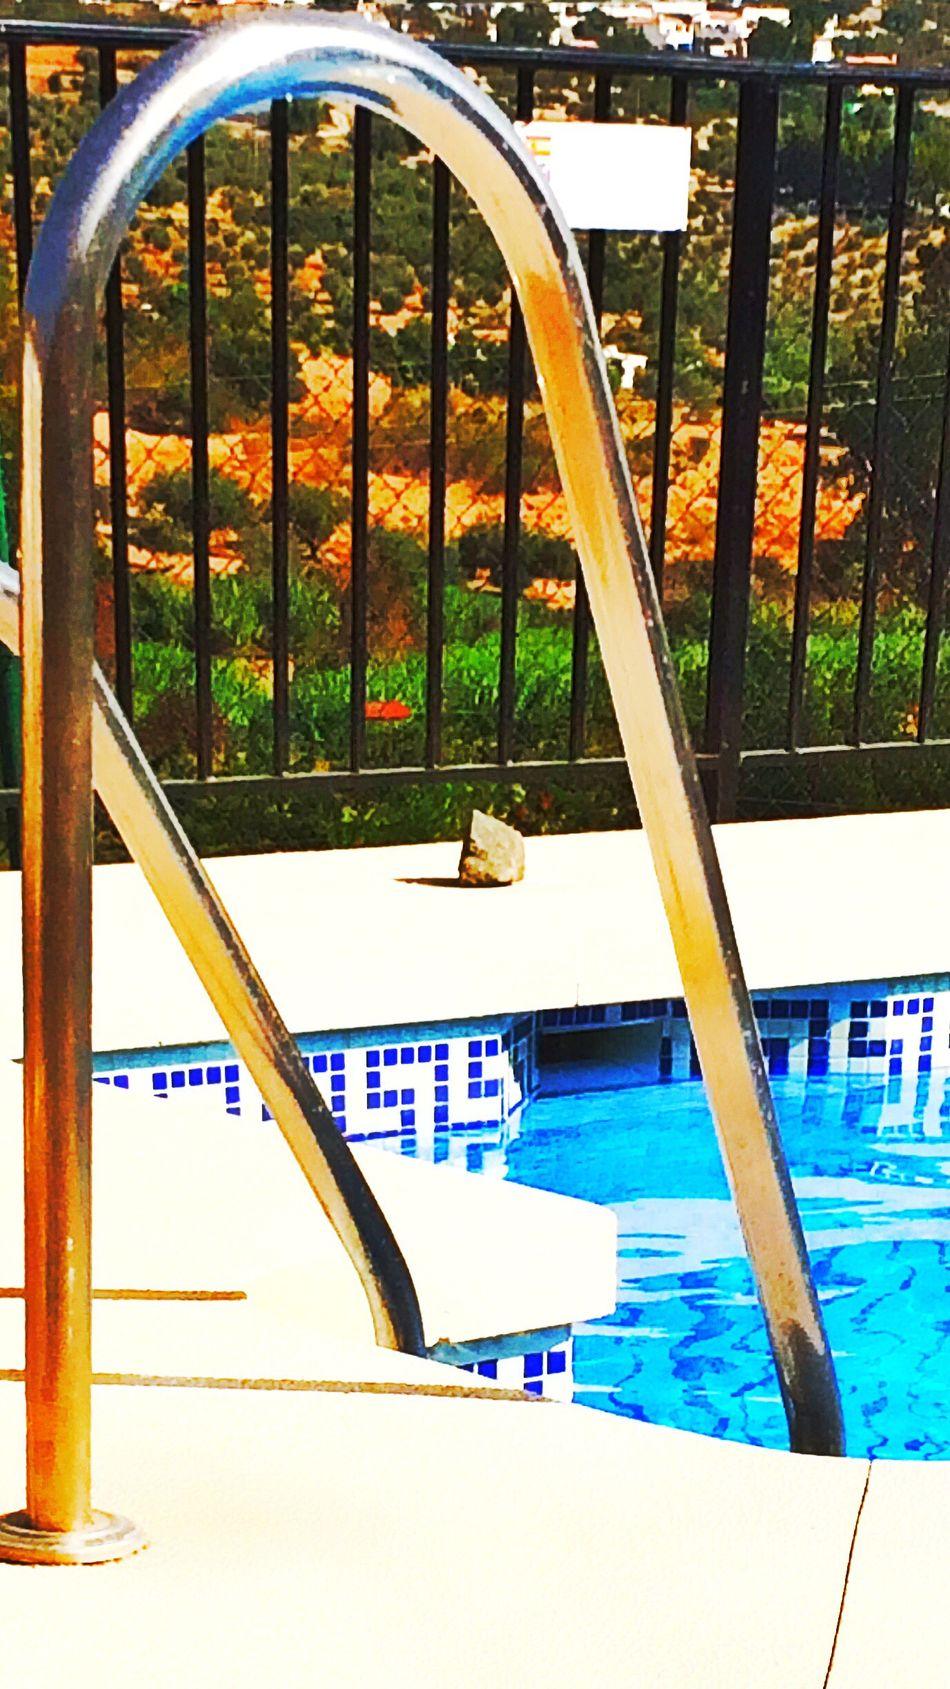 Color Palette Pool Time Pool Steps Spain ♥